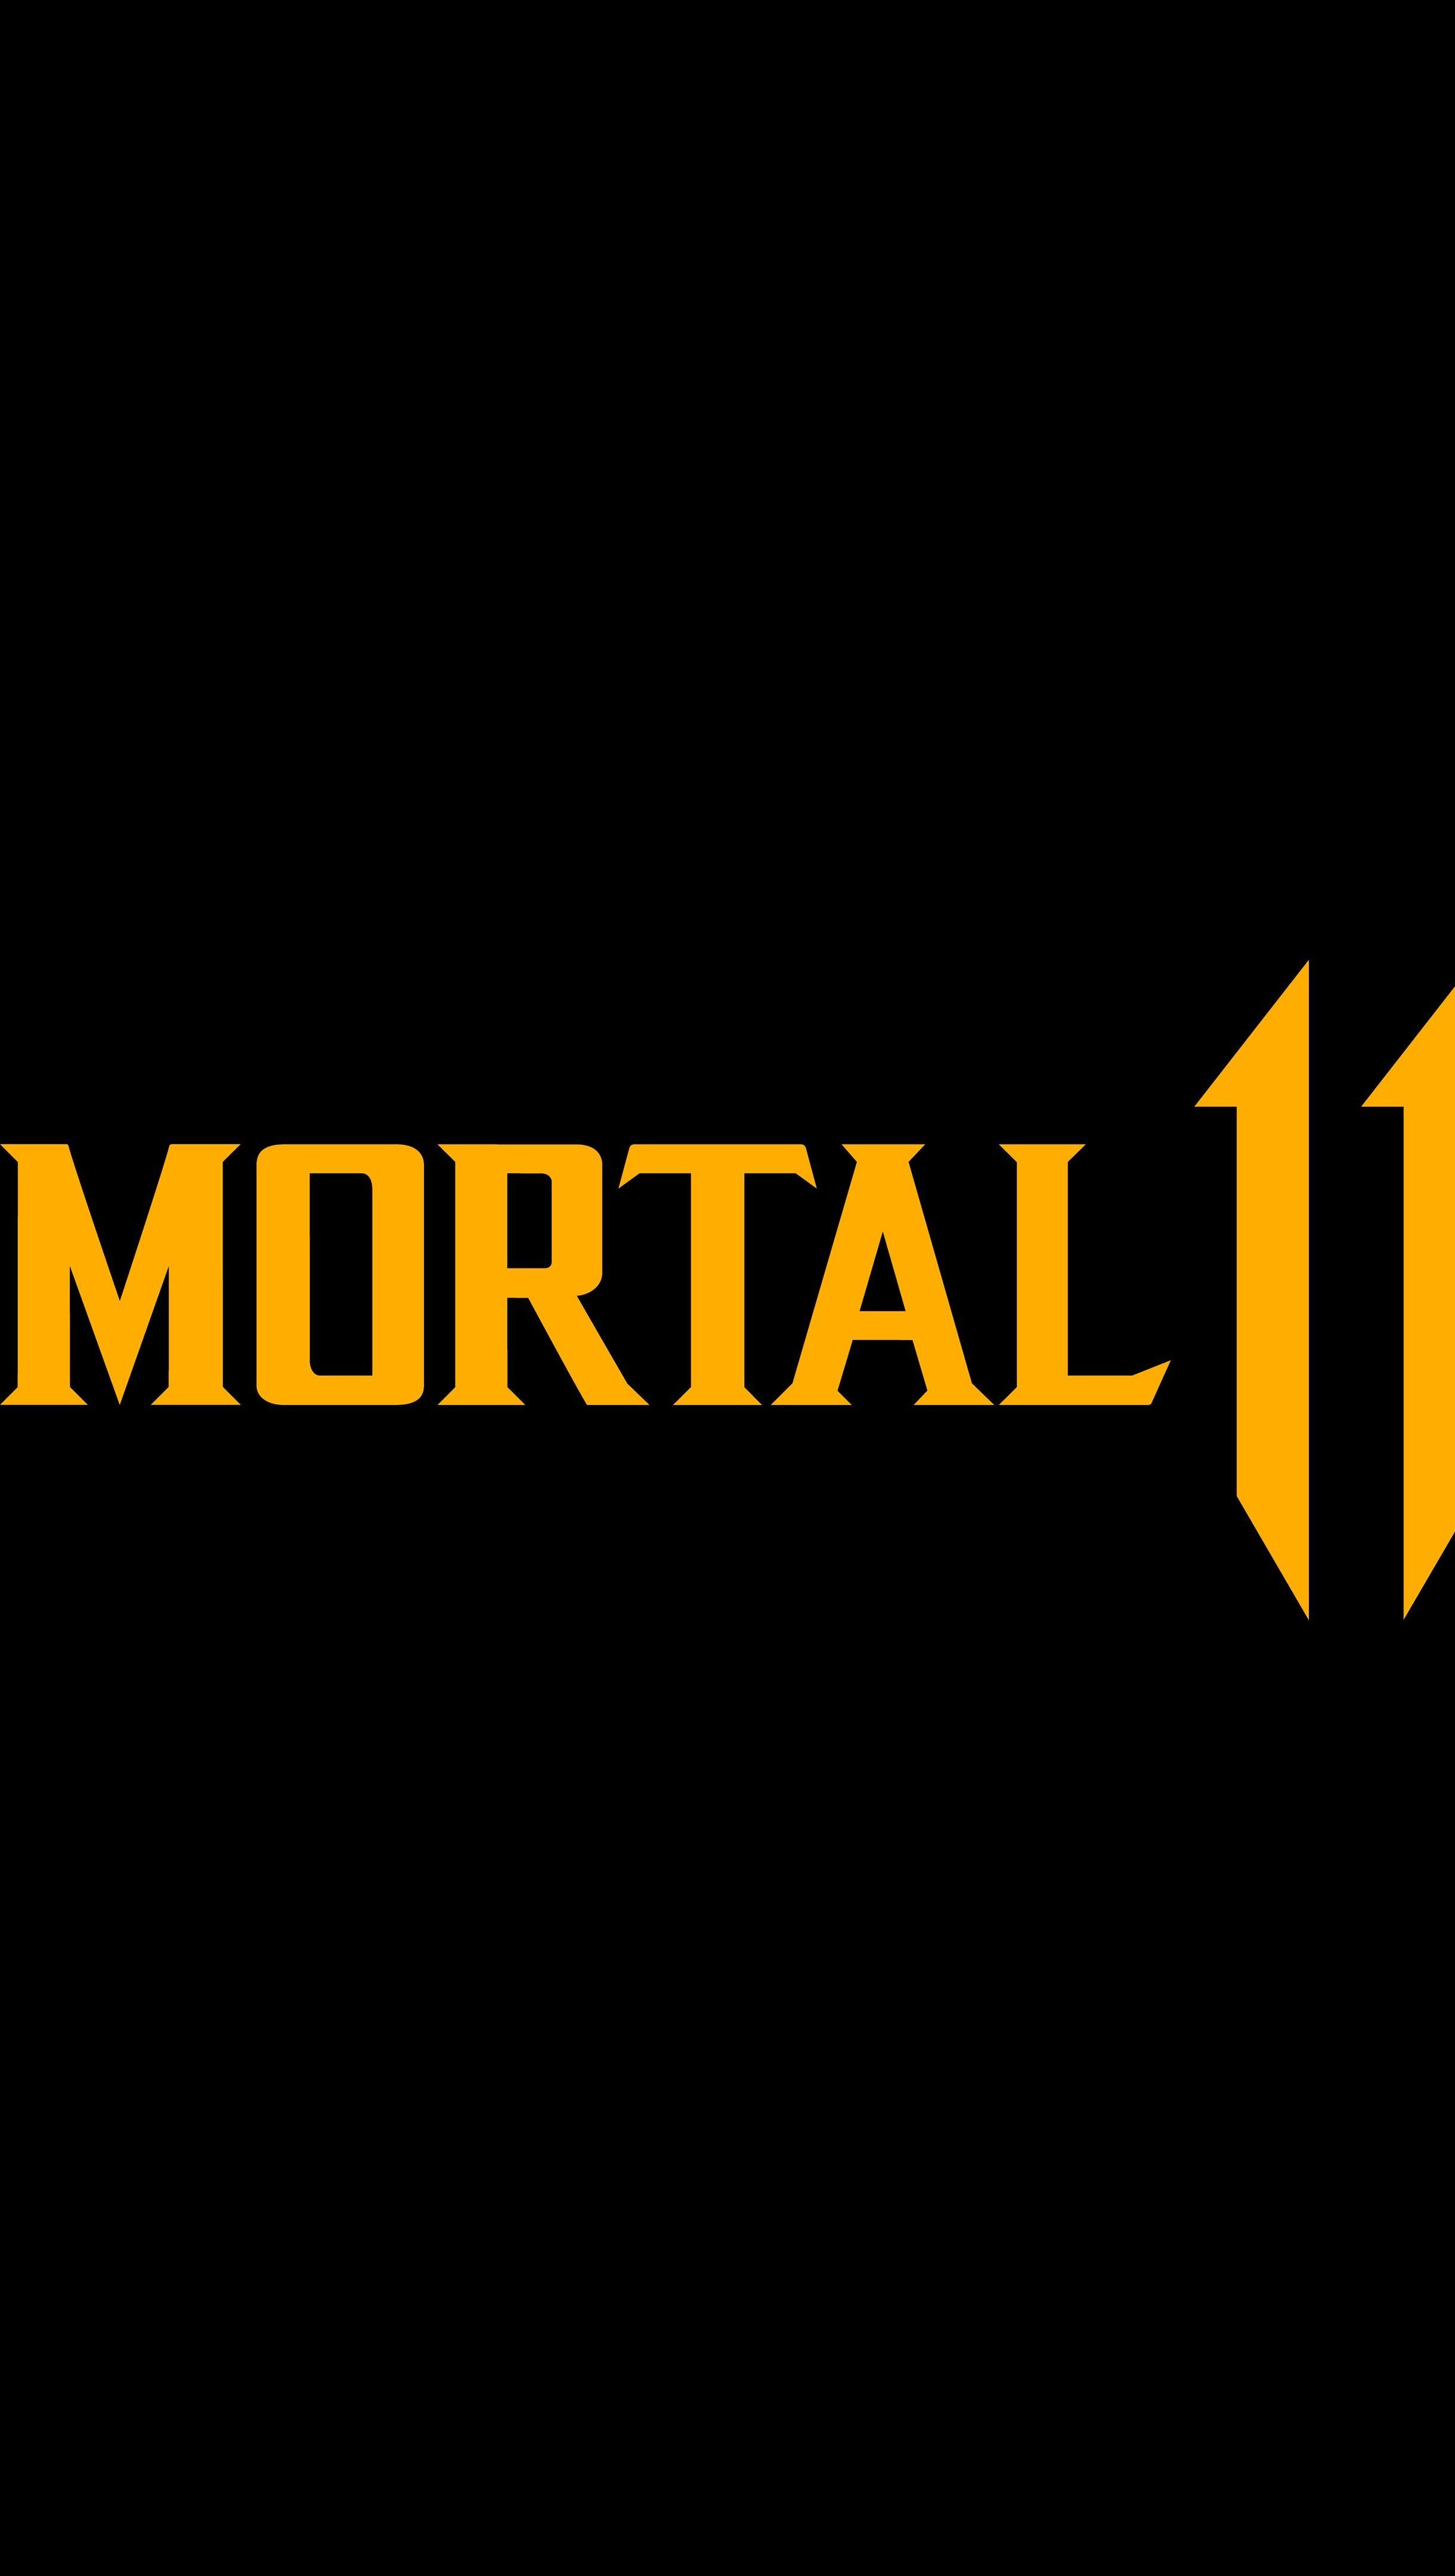 Fondos de pantalla Mortal Kombat 11 Logo Vertical